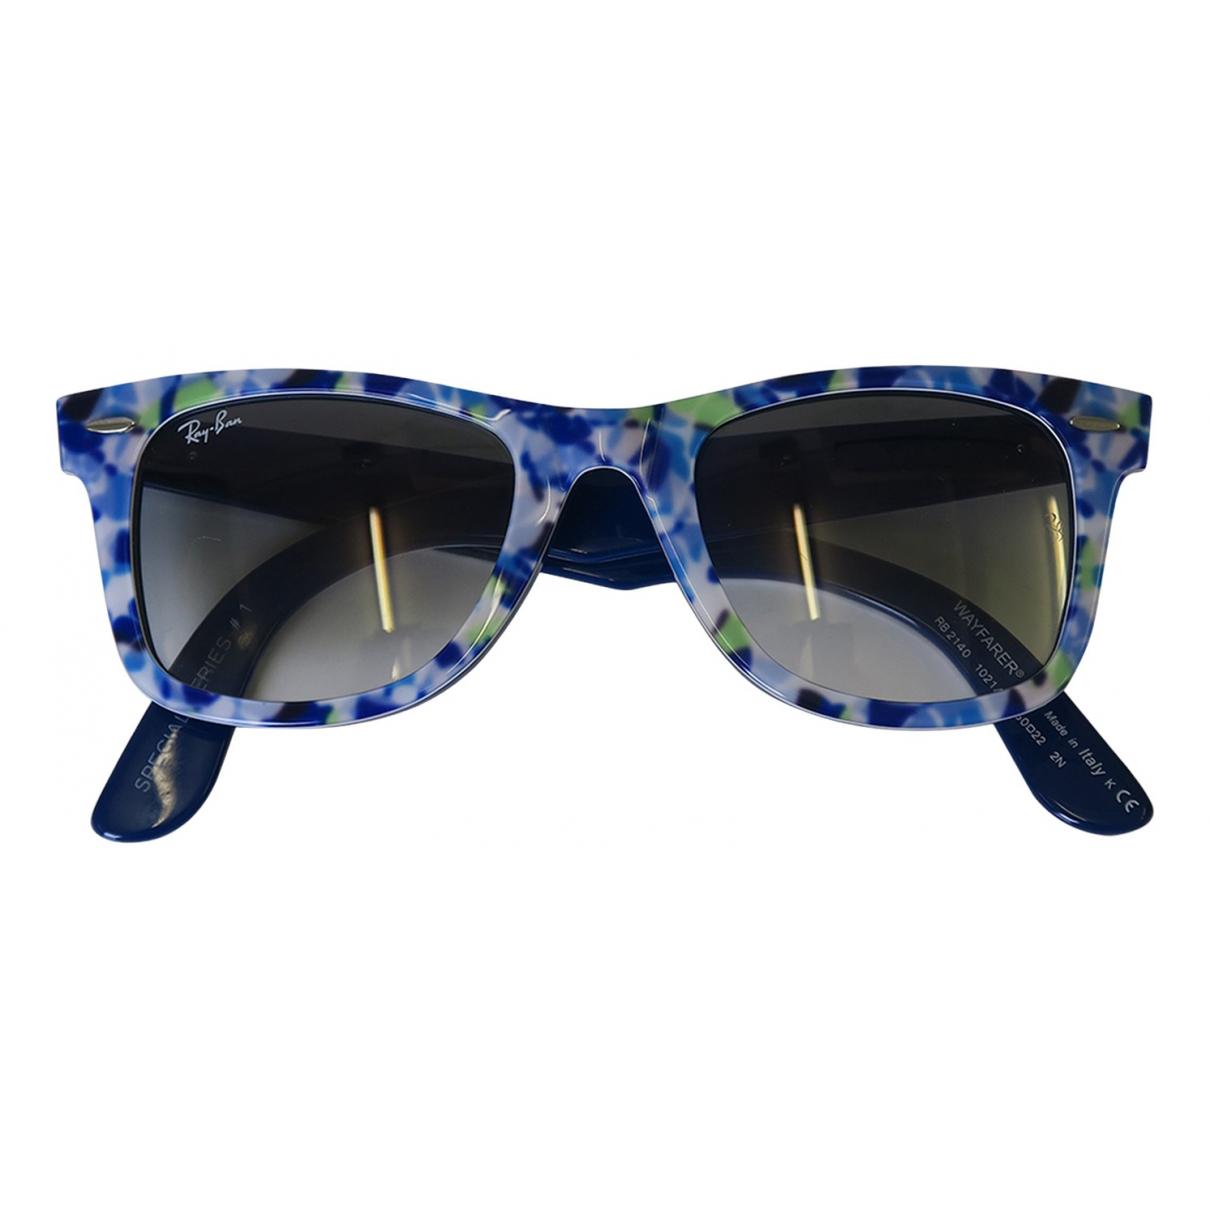 Ray-ban N Multicolour Sunglasses for Women N